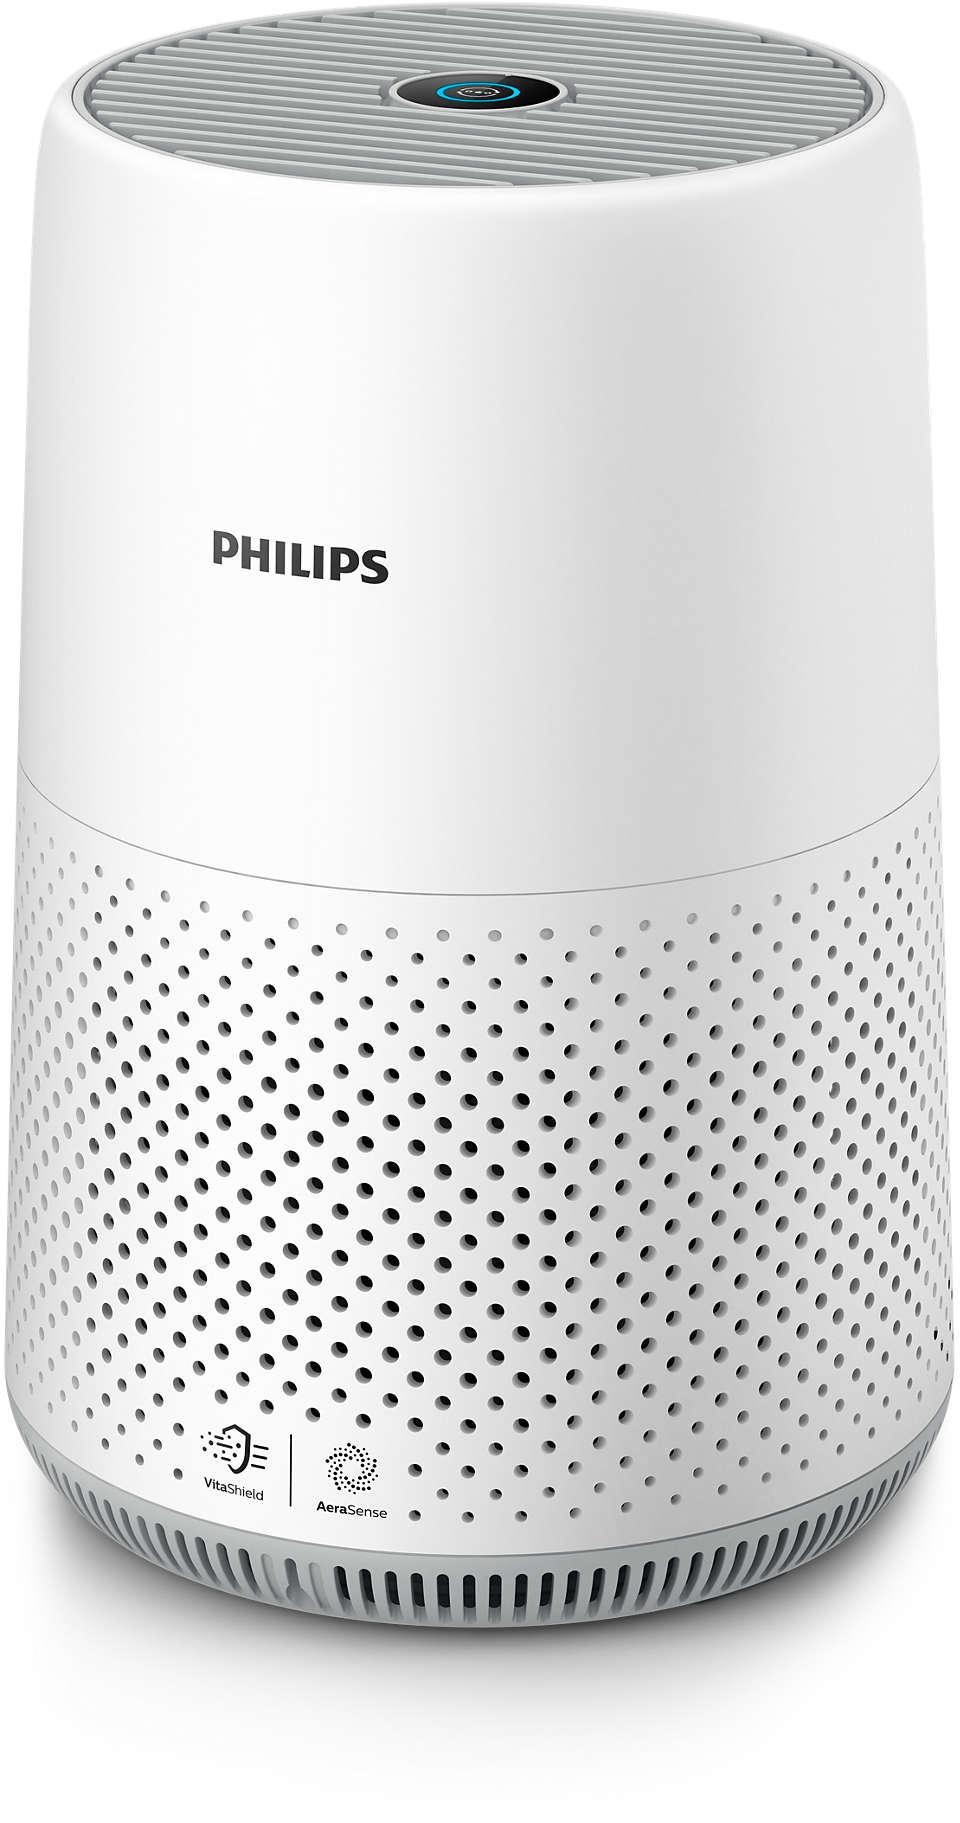 Purifies the air in less than 16 mins (1)